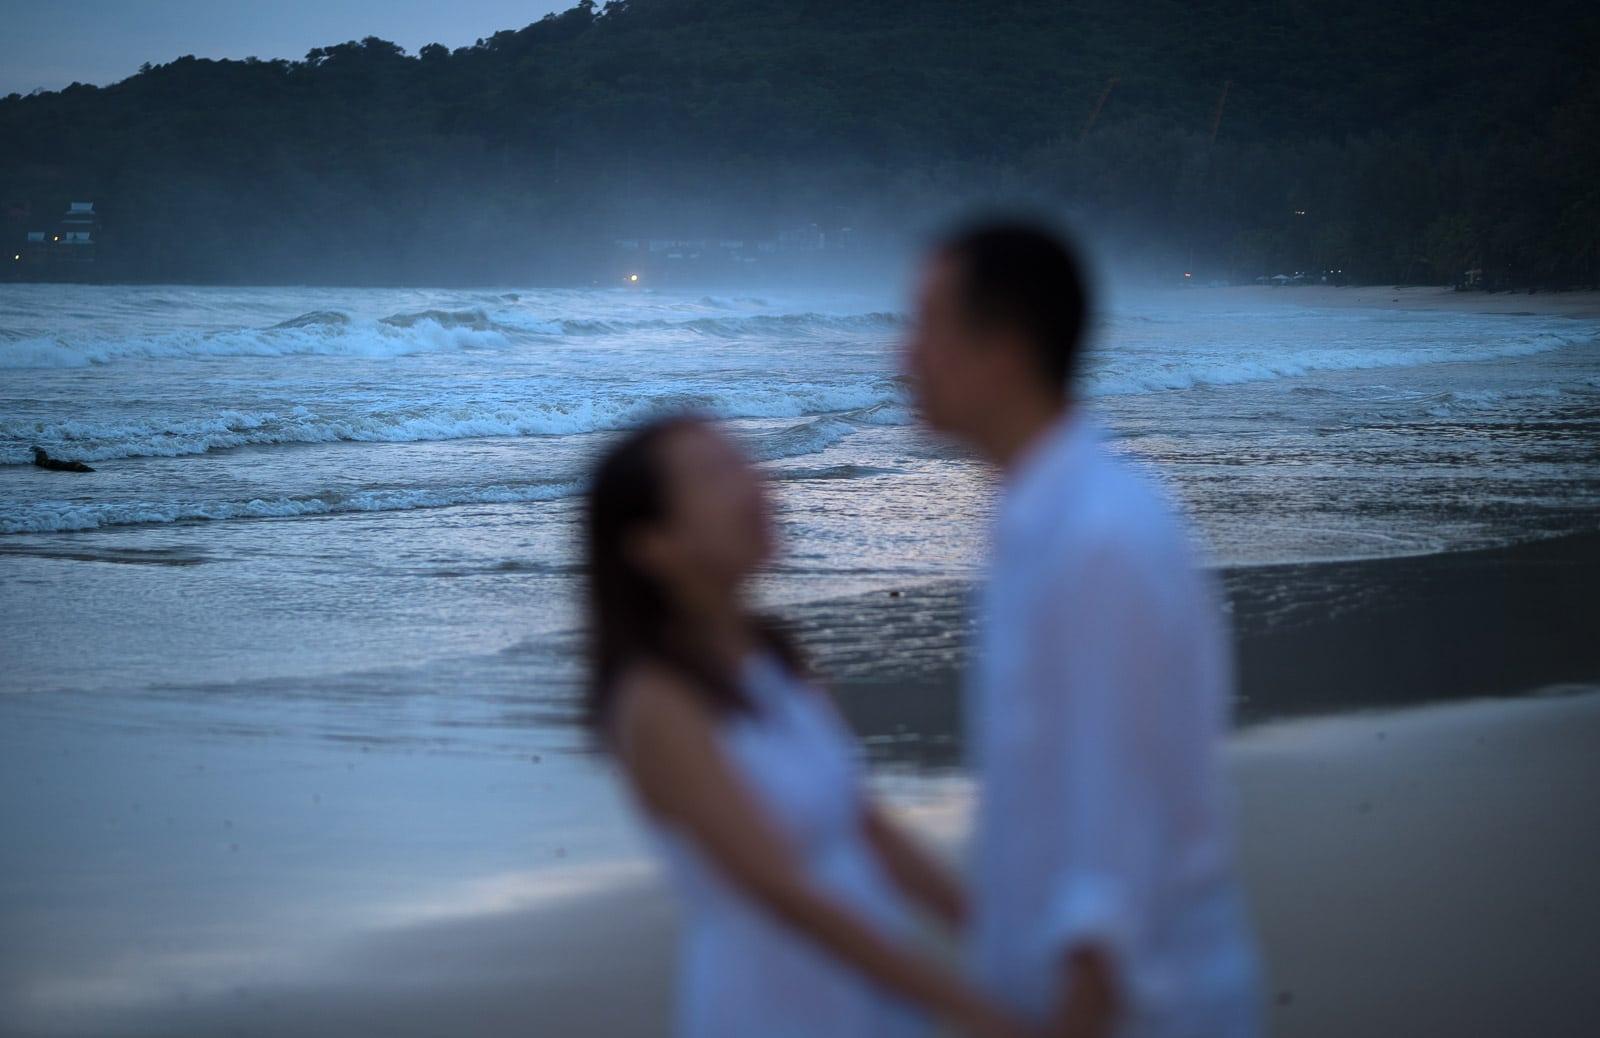 phuket-prewedding-photographer-thailand-wedding-photography-014